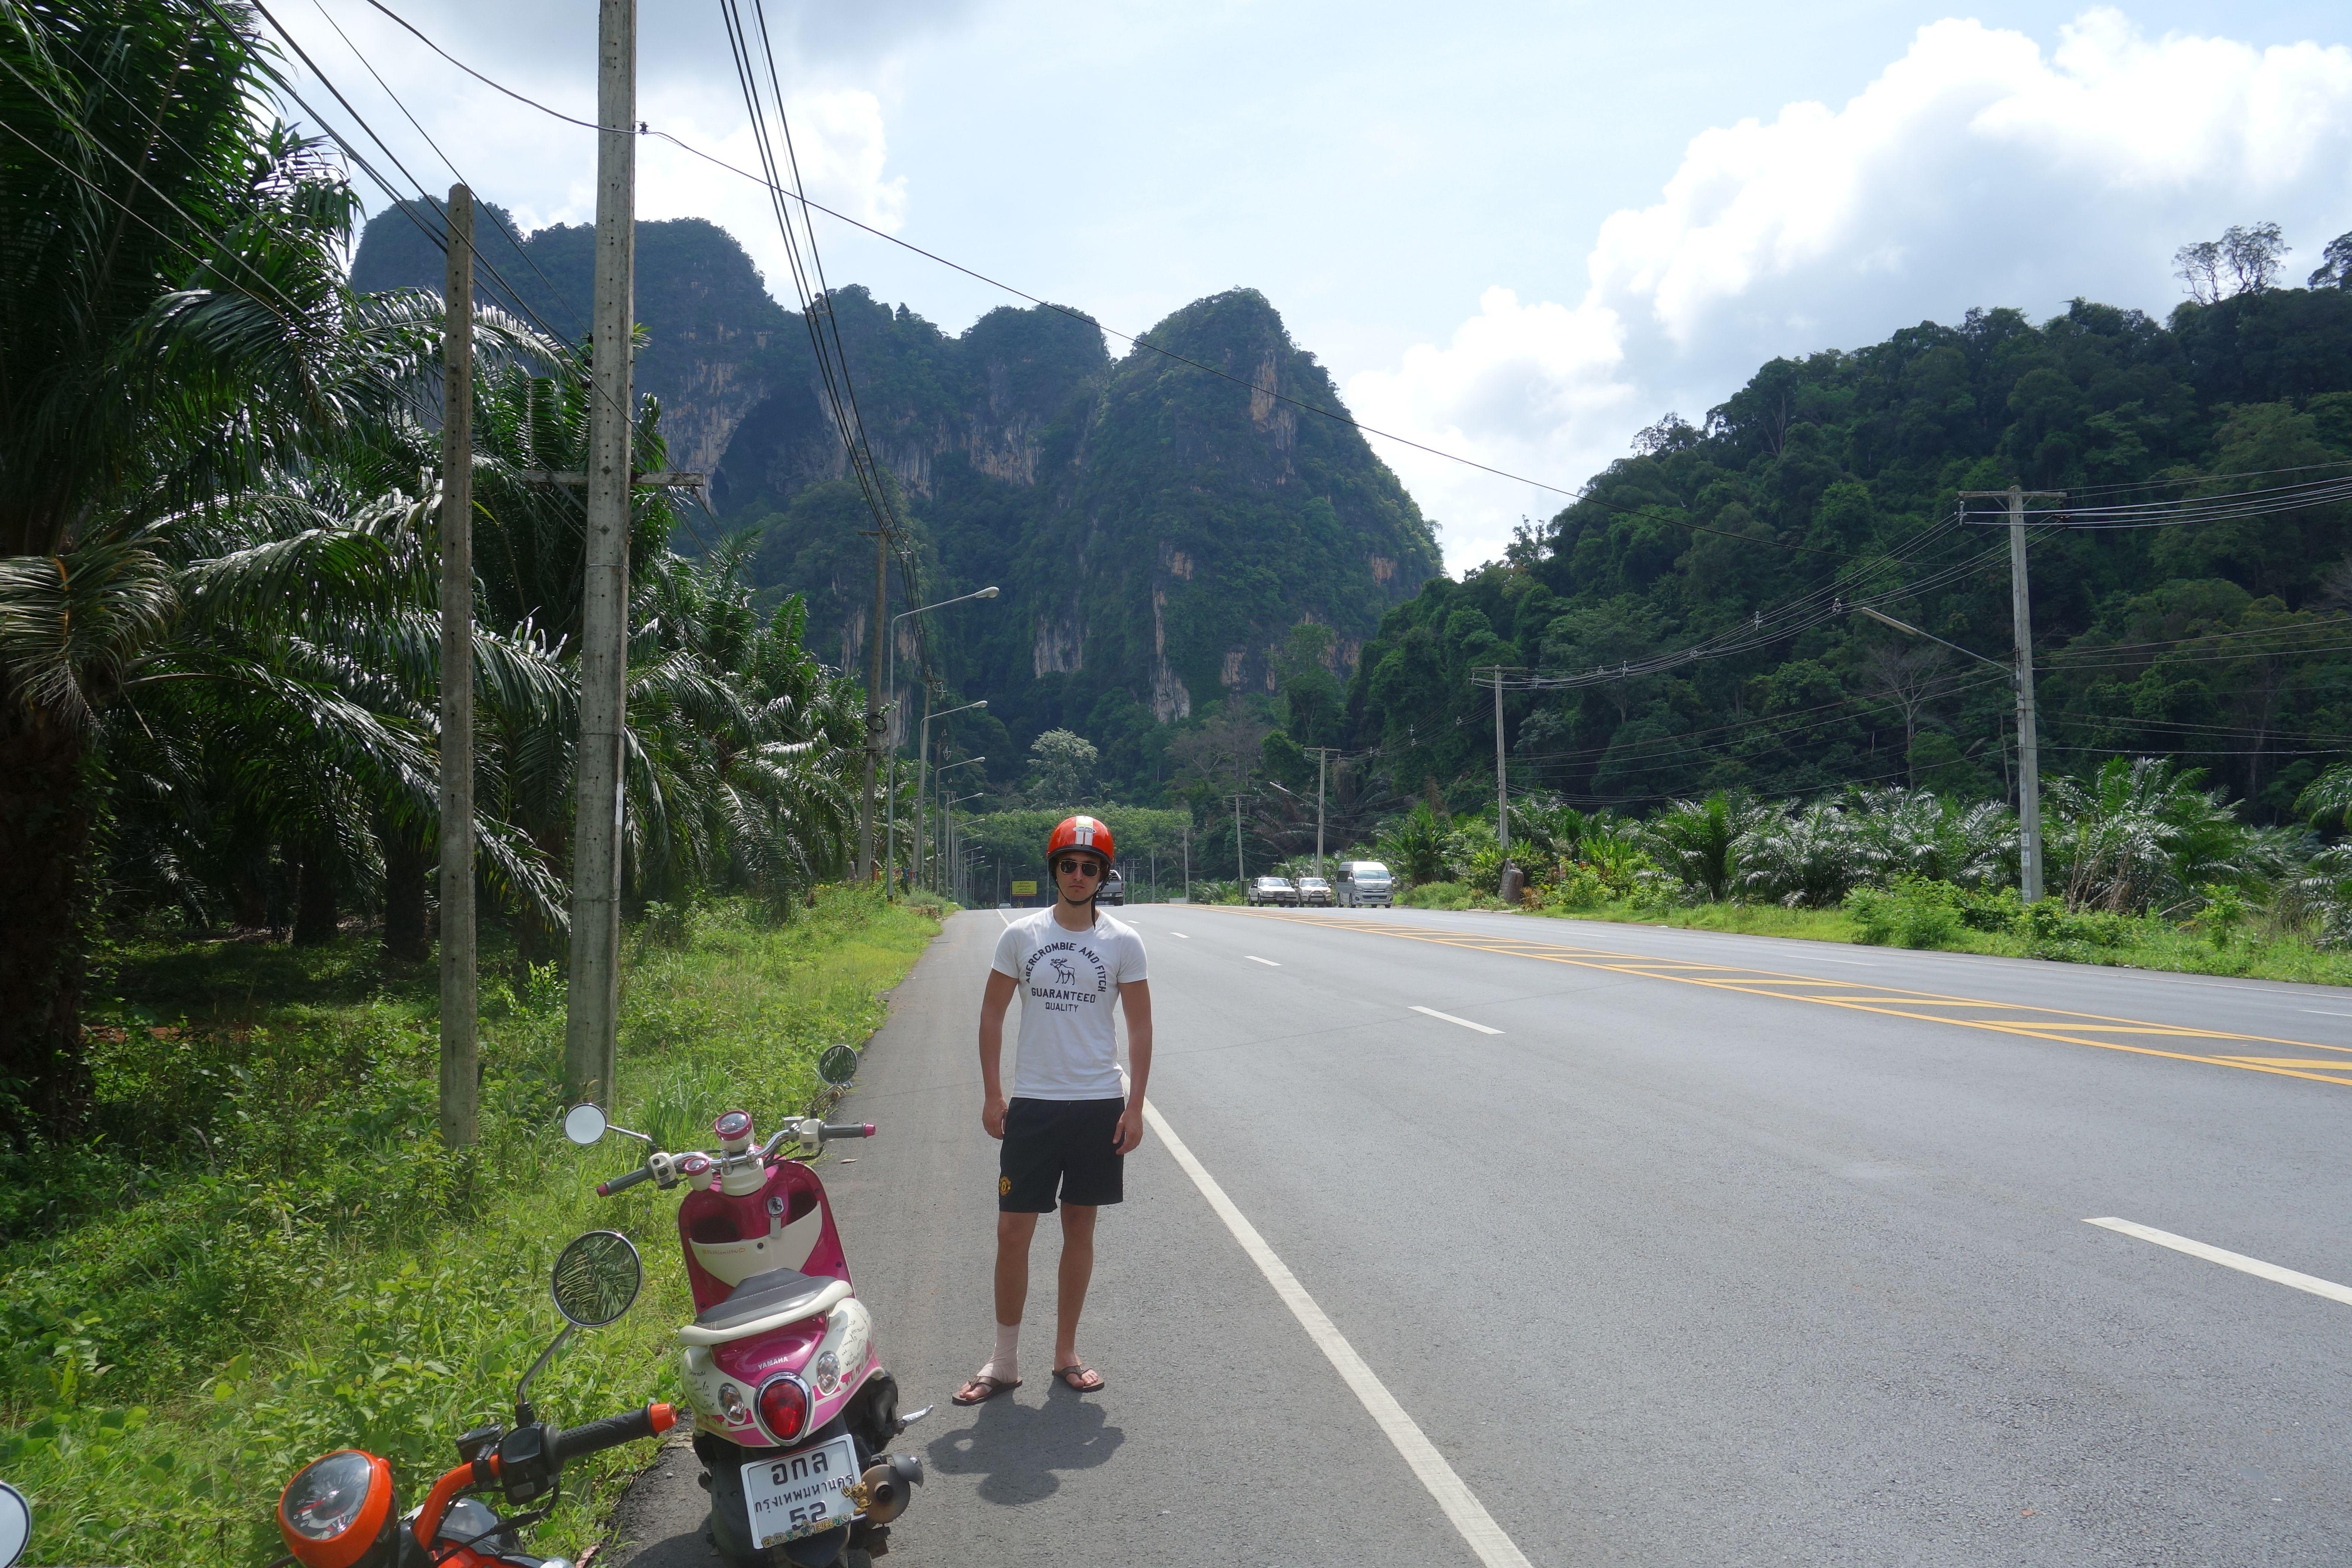 Riding a bike near krabi, great view. Thailand